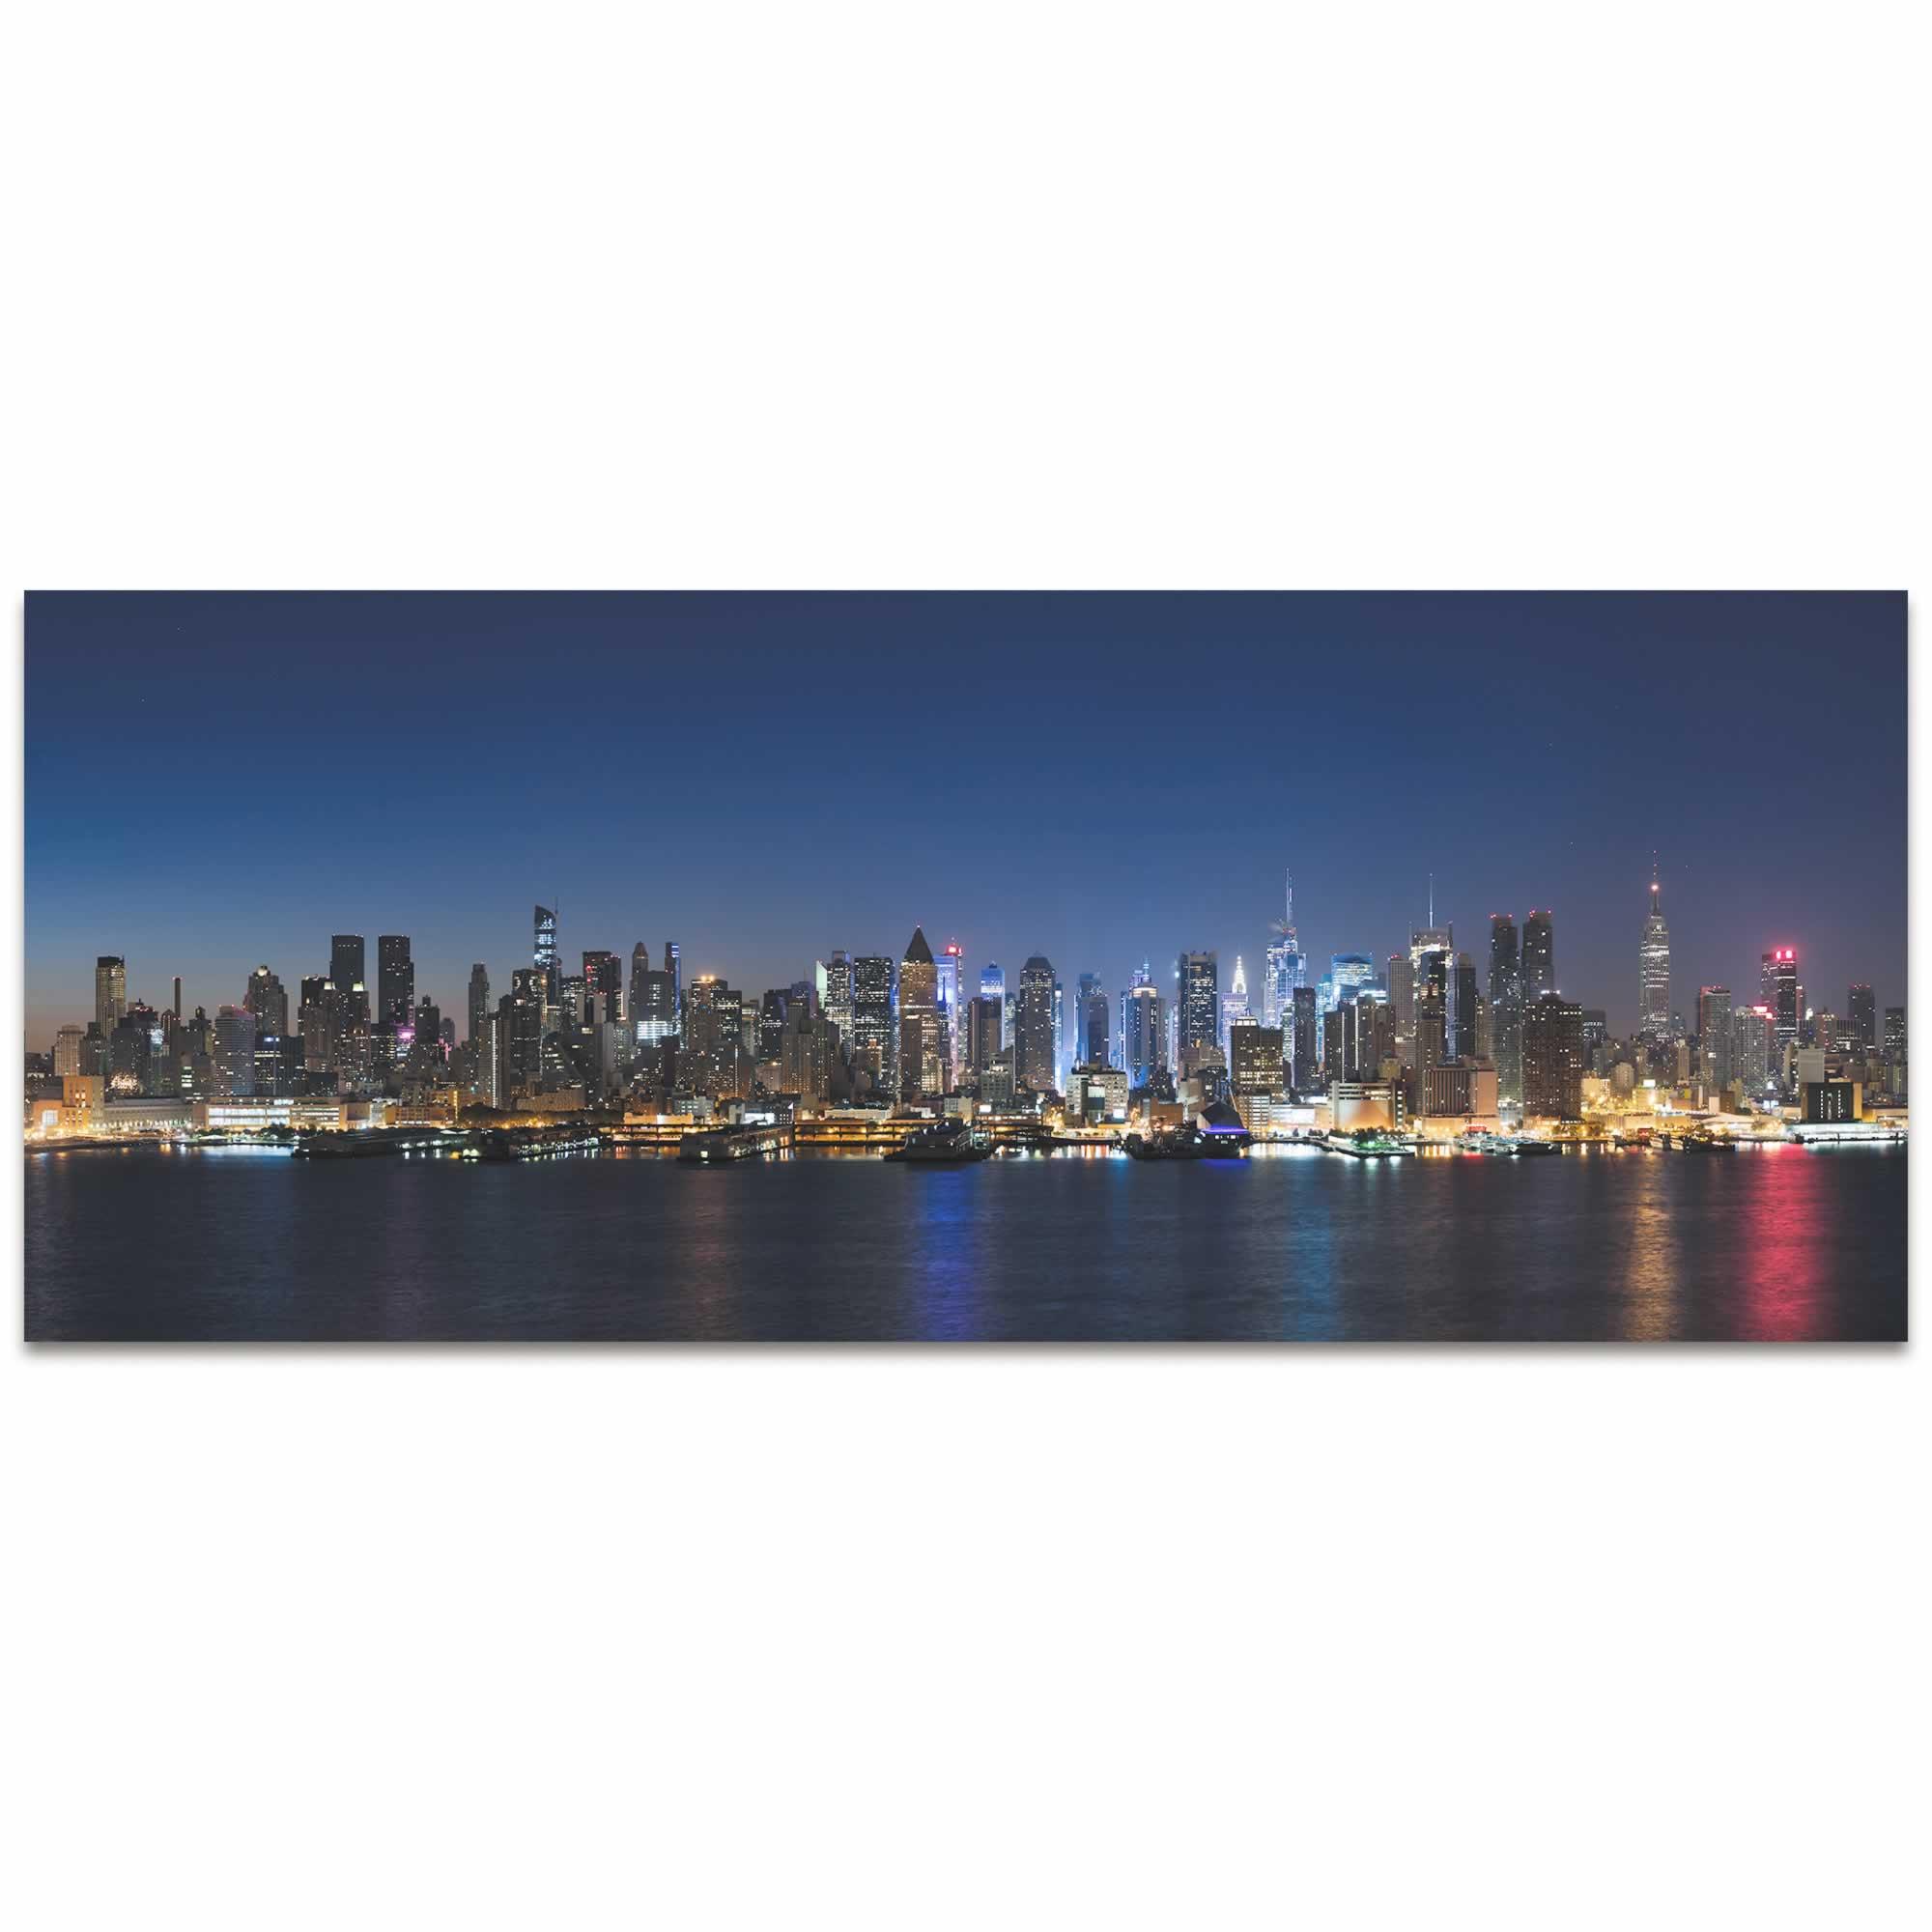 New York Harbor City Skyline - Urban Modern Art, Designer Home Decor, Cityscape Wall Artwork, Trendy Contemporary Art - Alternate View 2